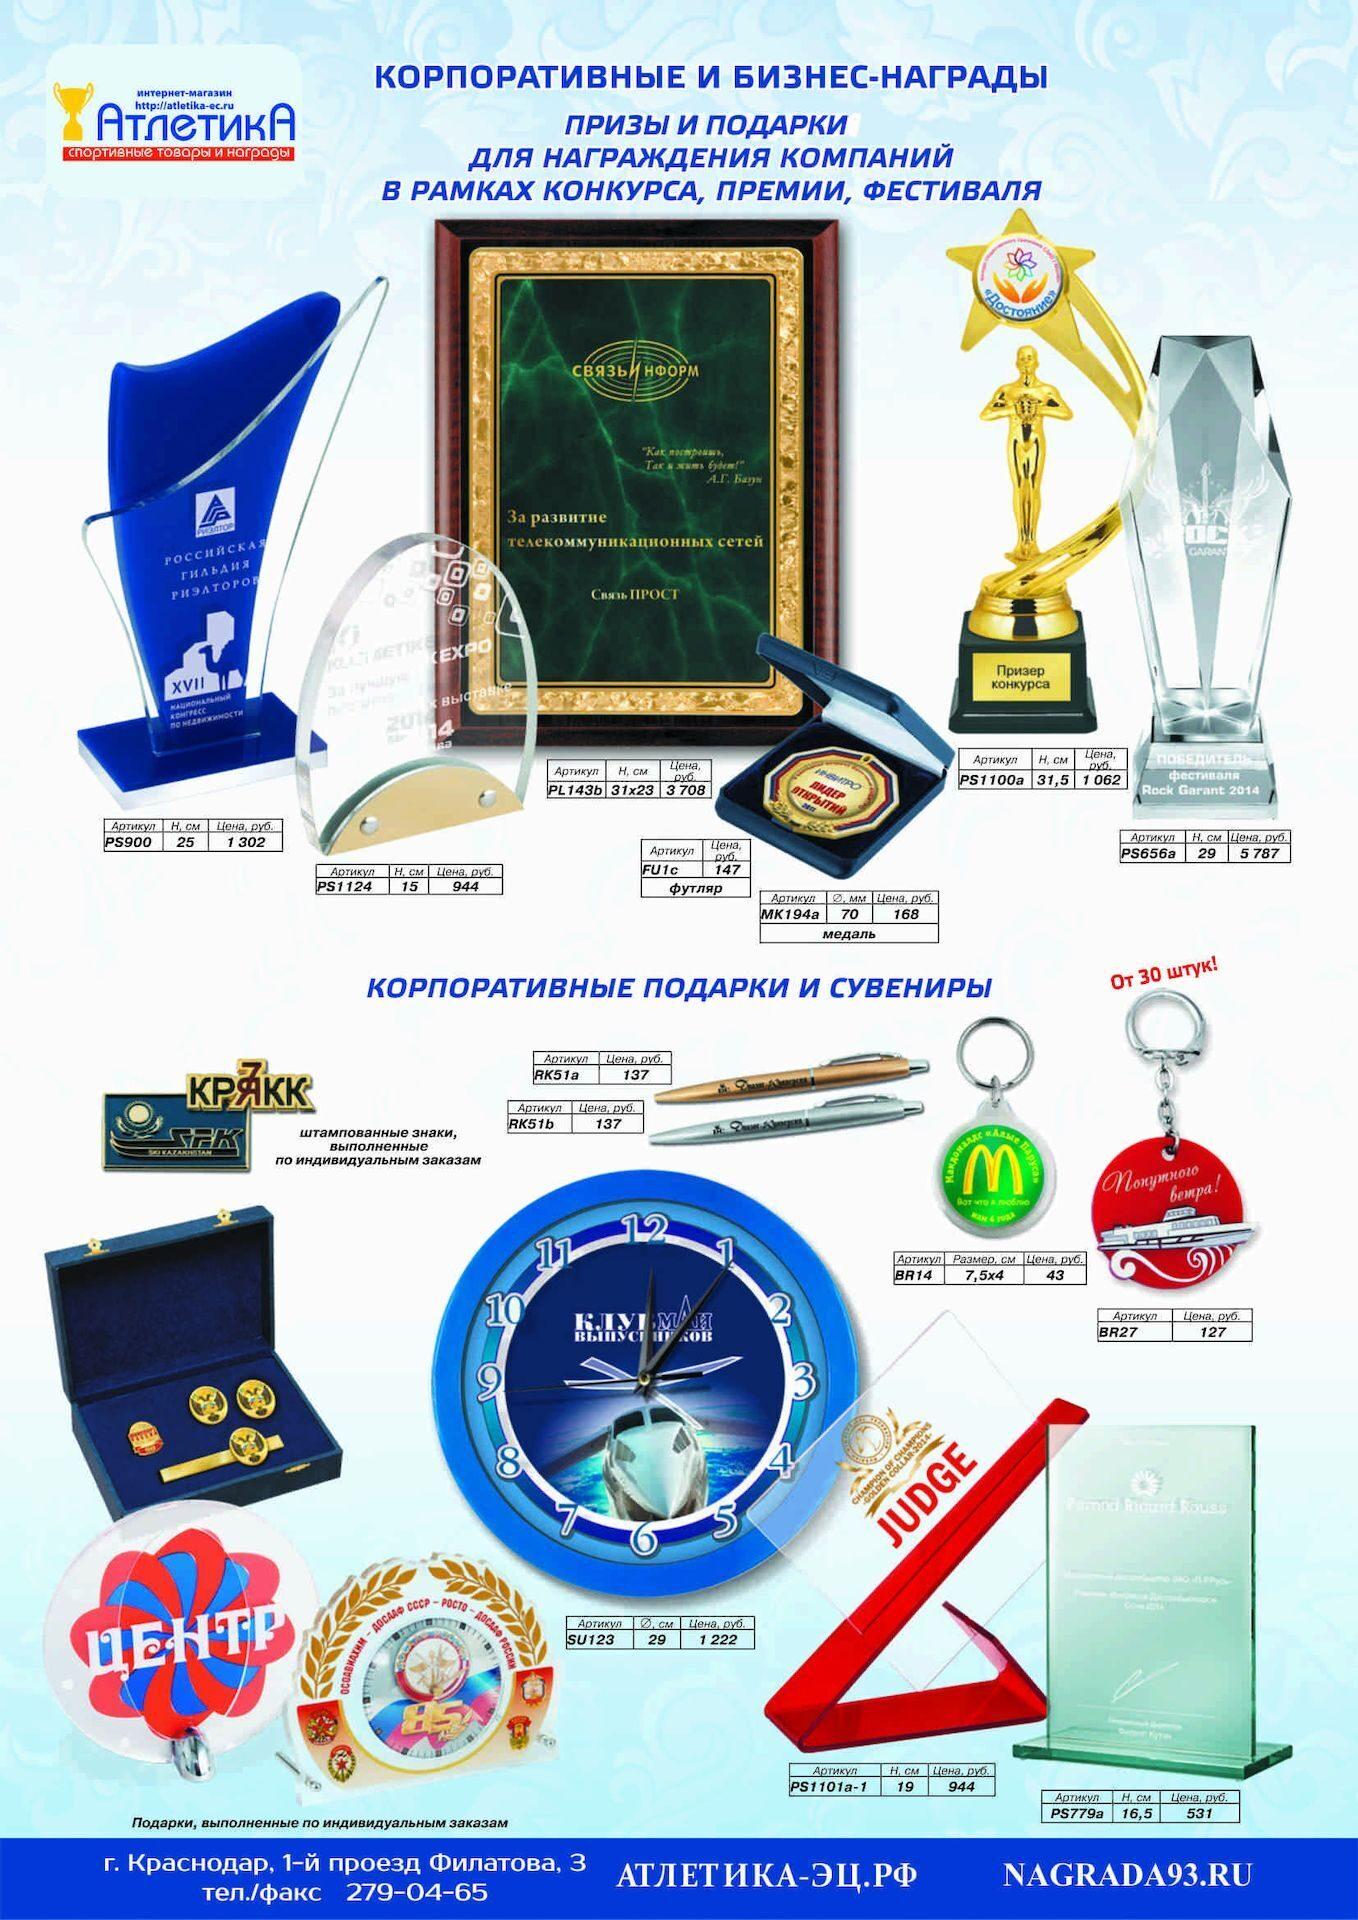 Награда за корпоративный конкурс